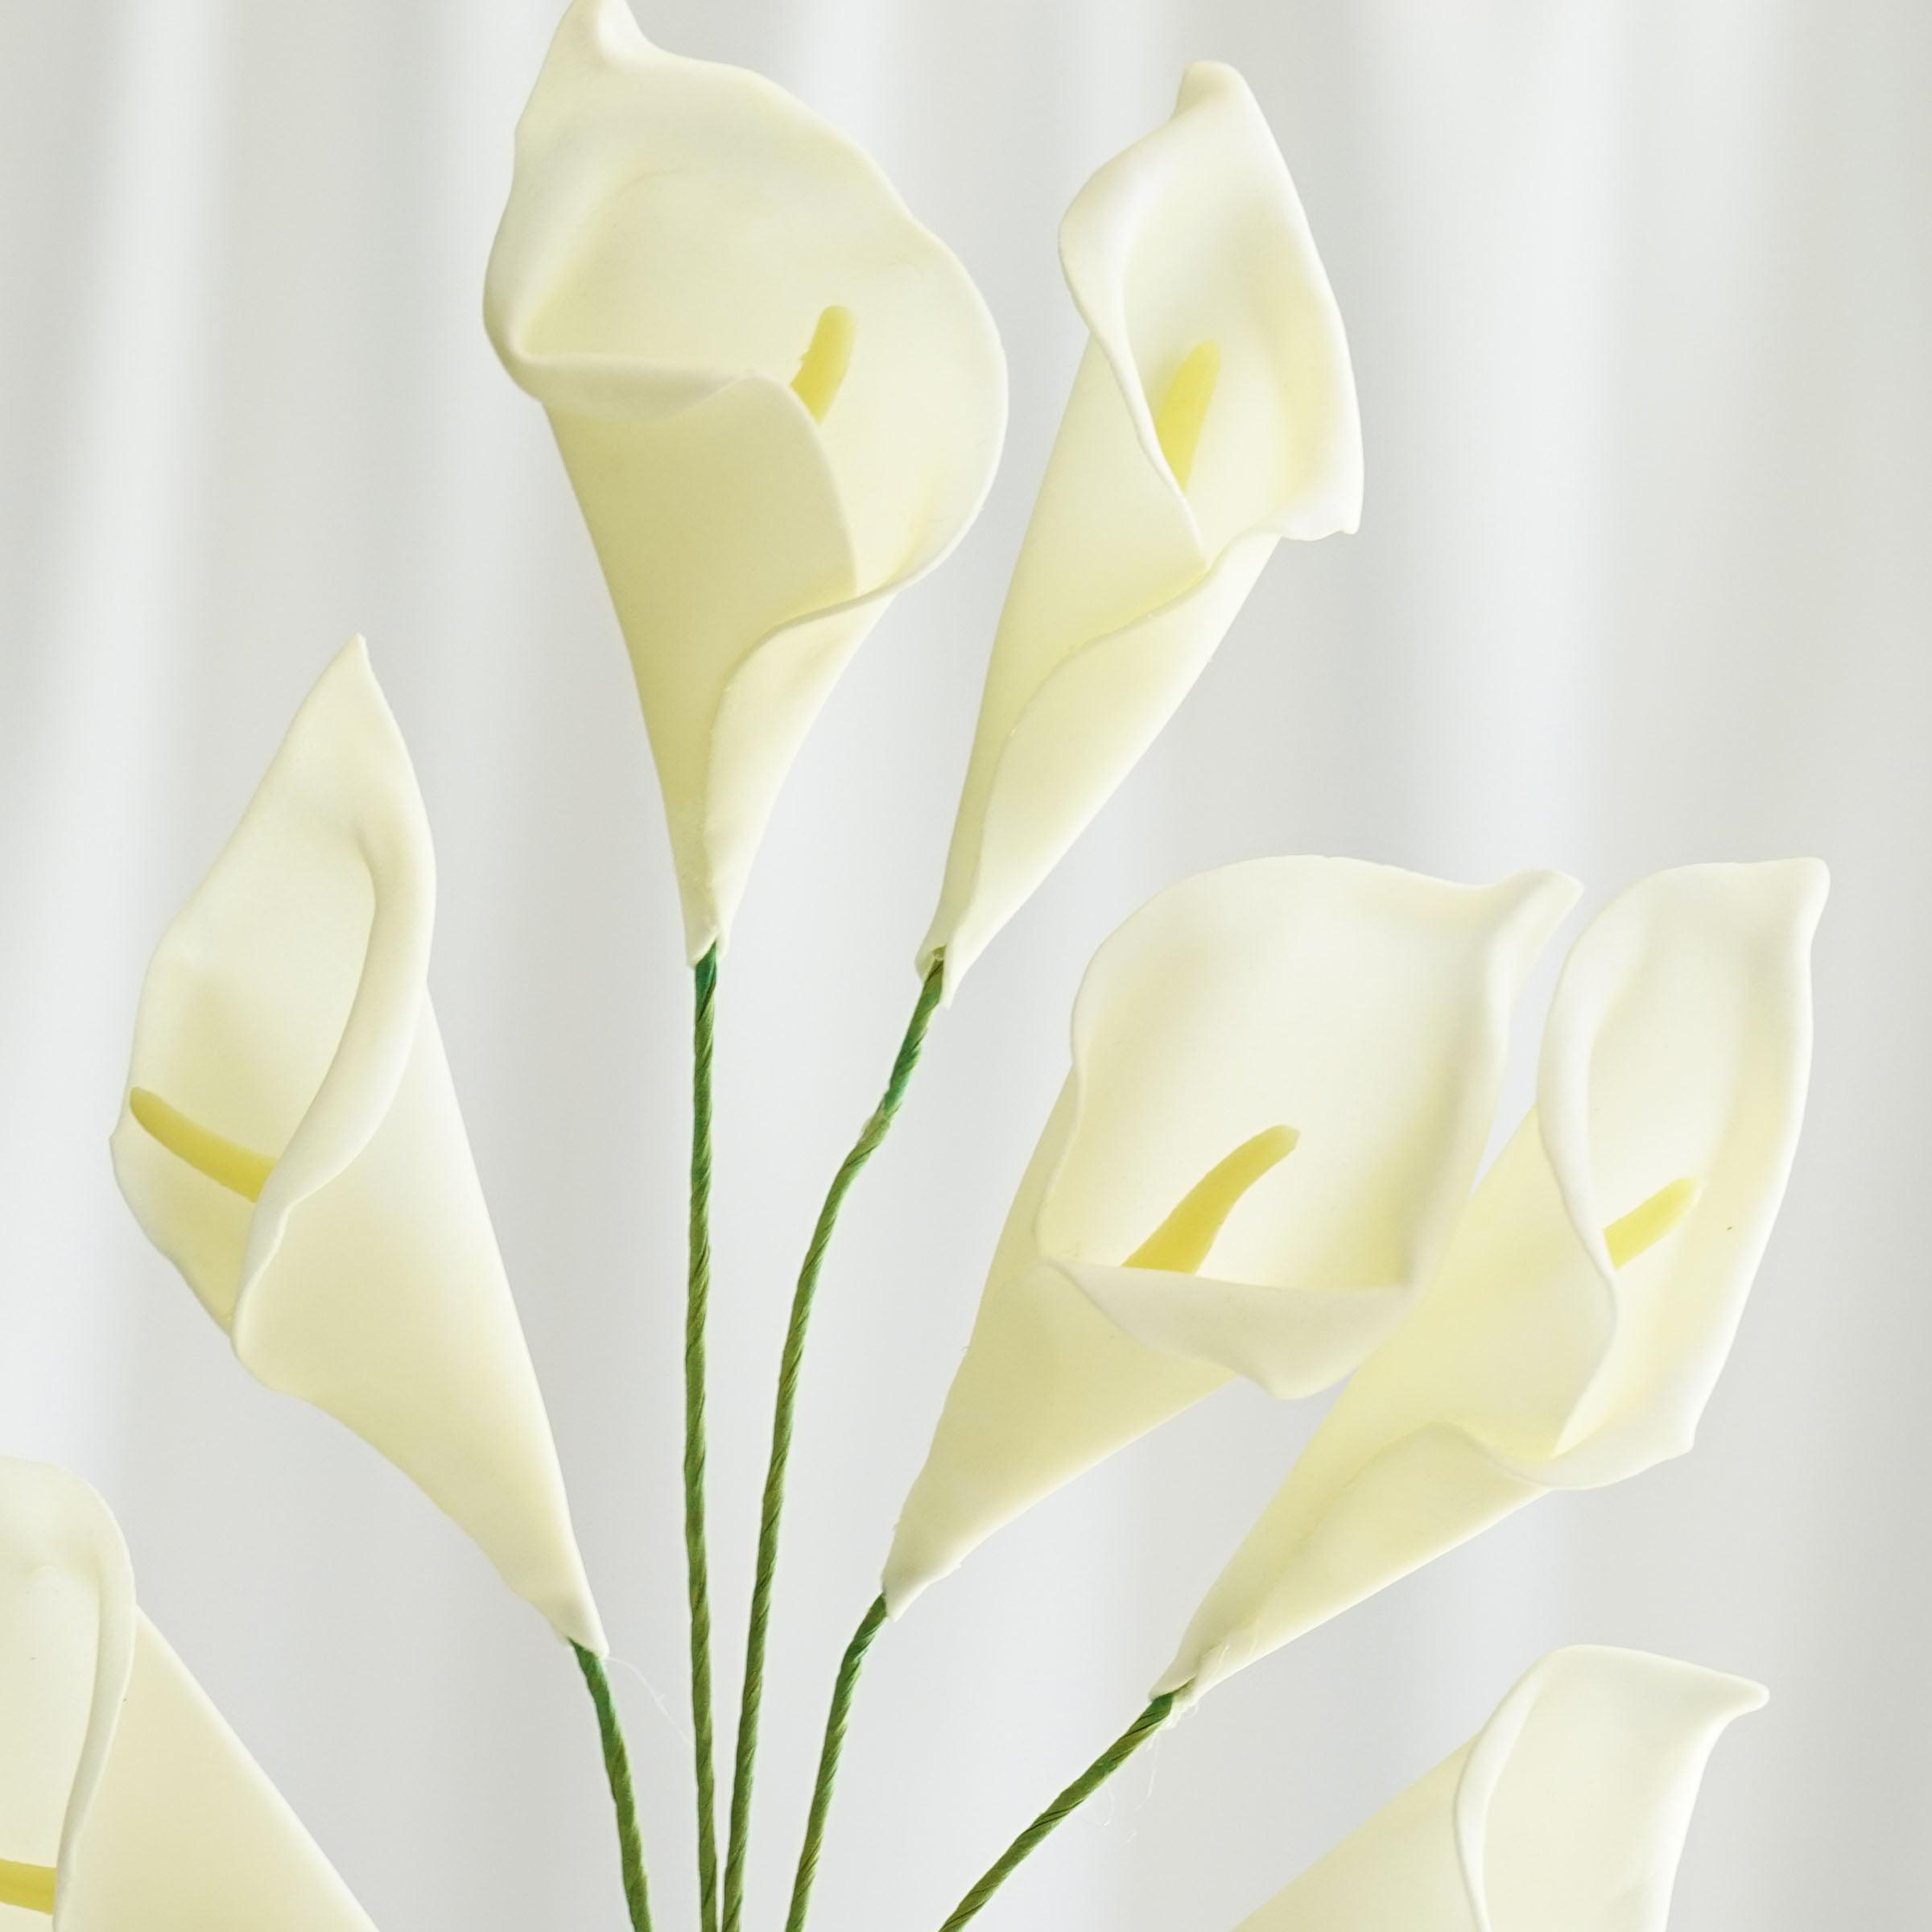 Balsacircle 42 calla lily artificial silk flowers diy home wedding balsacircle 42 calla lily artificial silk flowers diy home wedding party bouquets arrangements centerpieces walmart izmirmasajfo